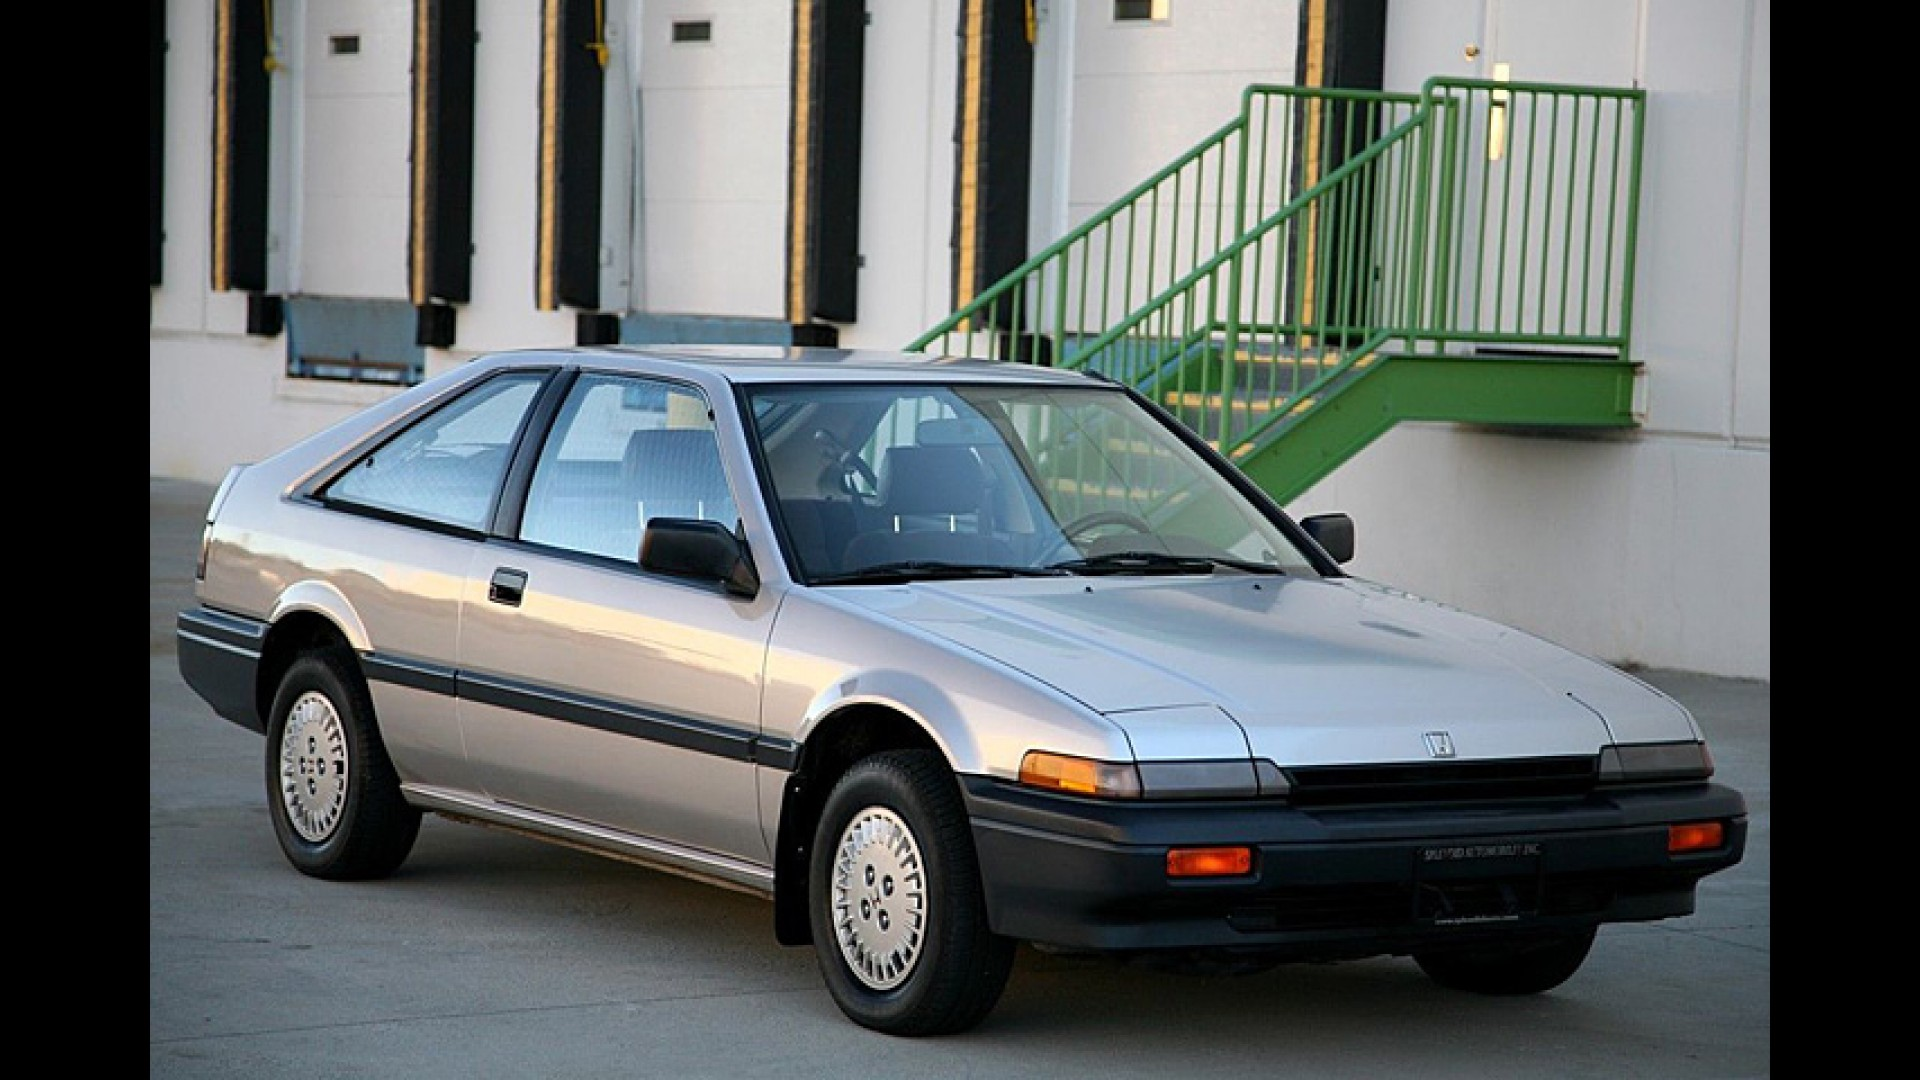 Old Honda Accord >> Commuter Classic This 87 Honda Accord Still Looks Brand New